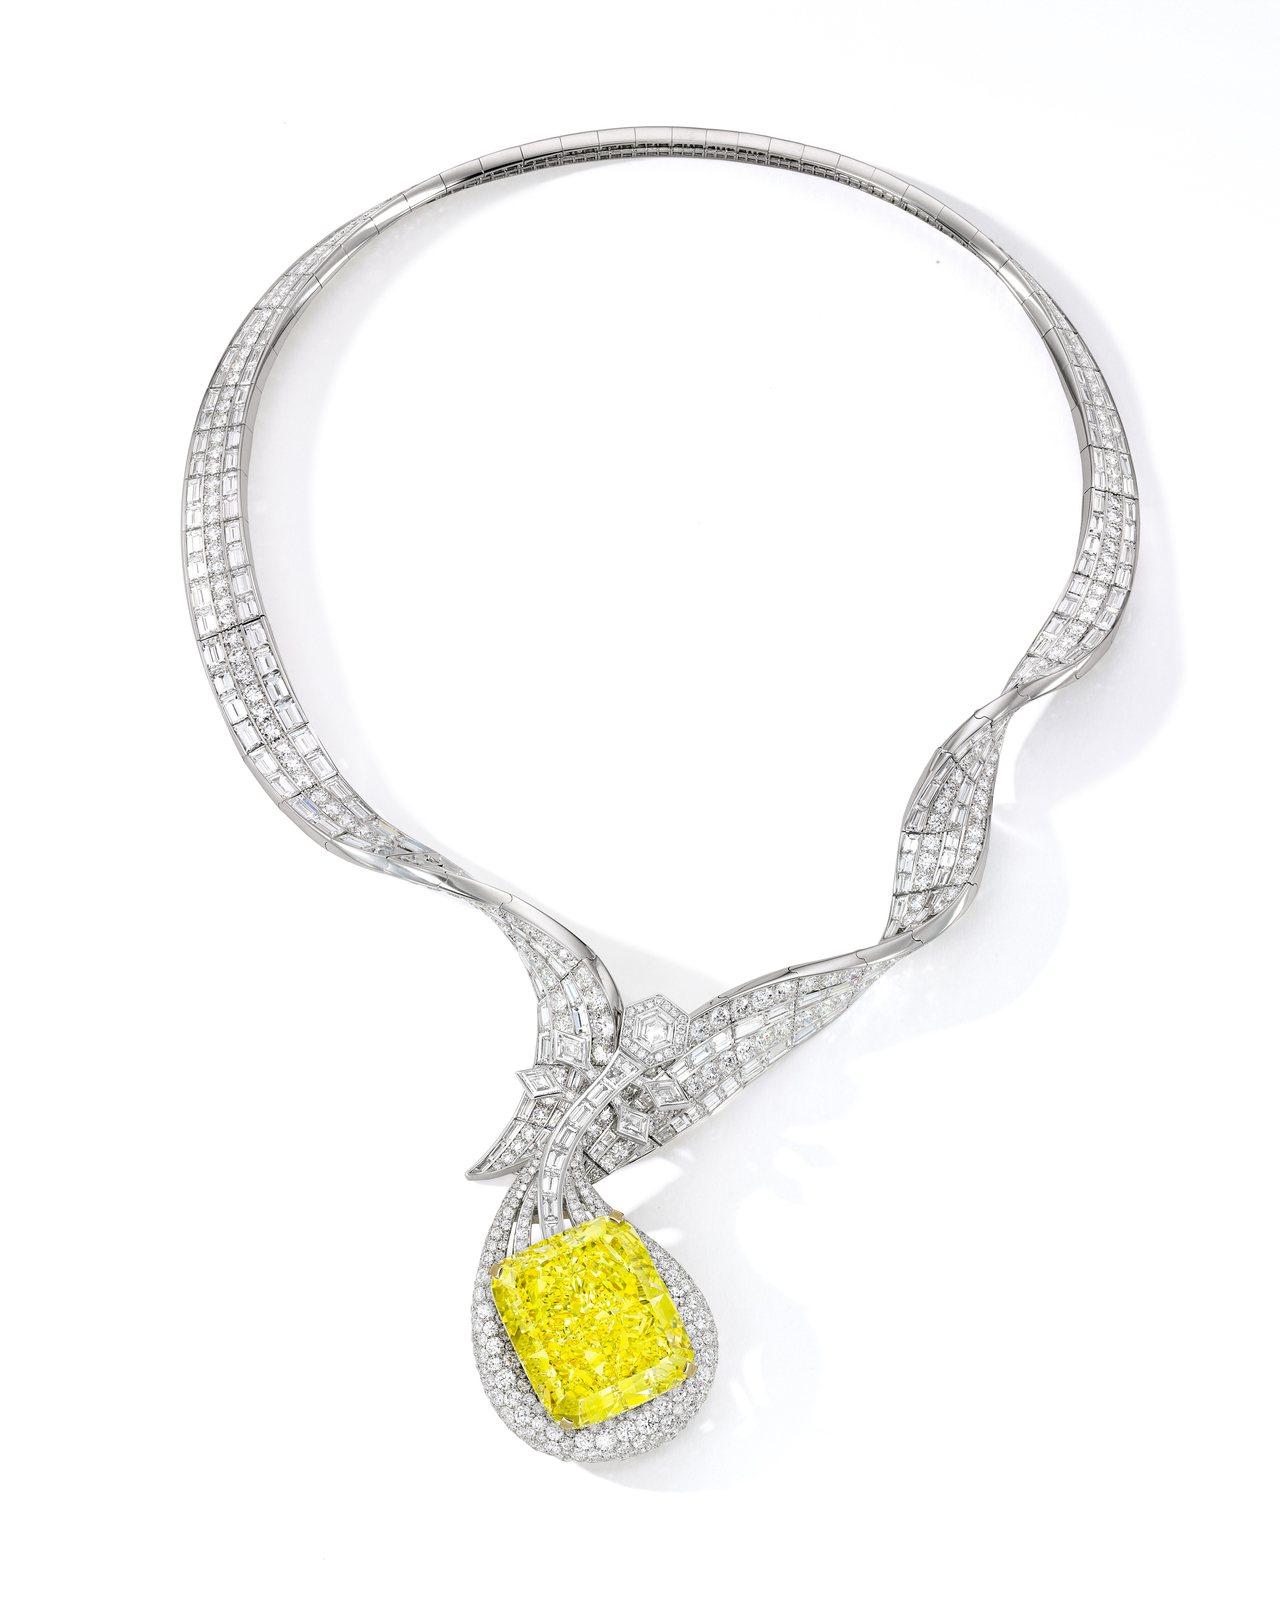 ANNA HU絲路音樂系列敦煌琵琶黃鑽項鍊,成交價約4,534萬8,000港幣。...